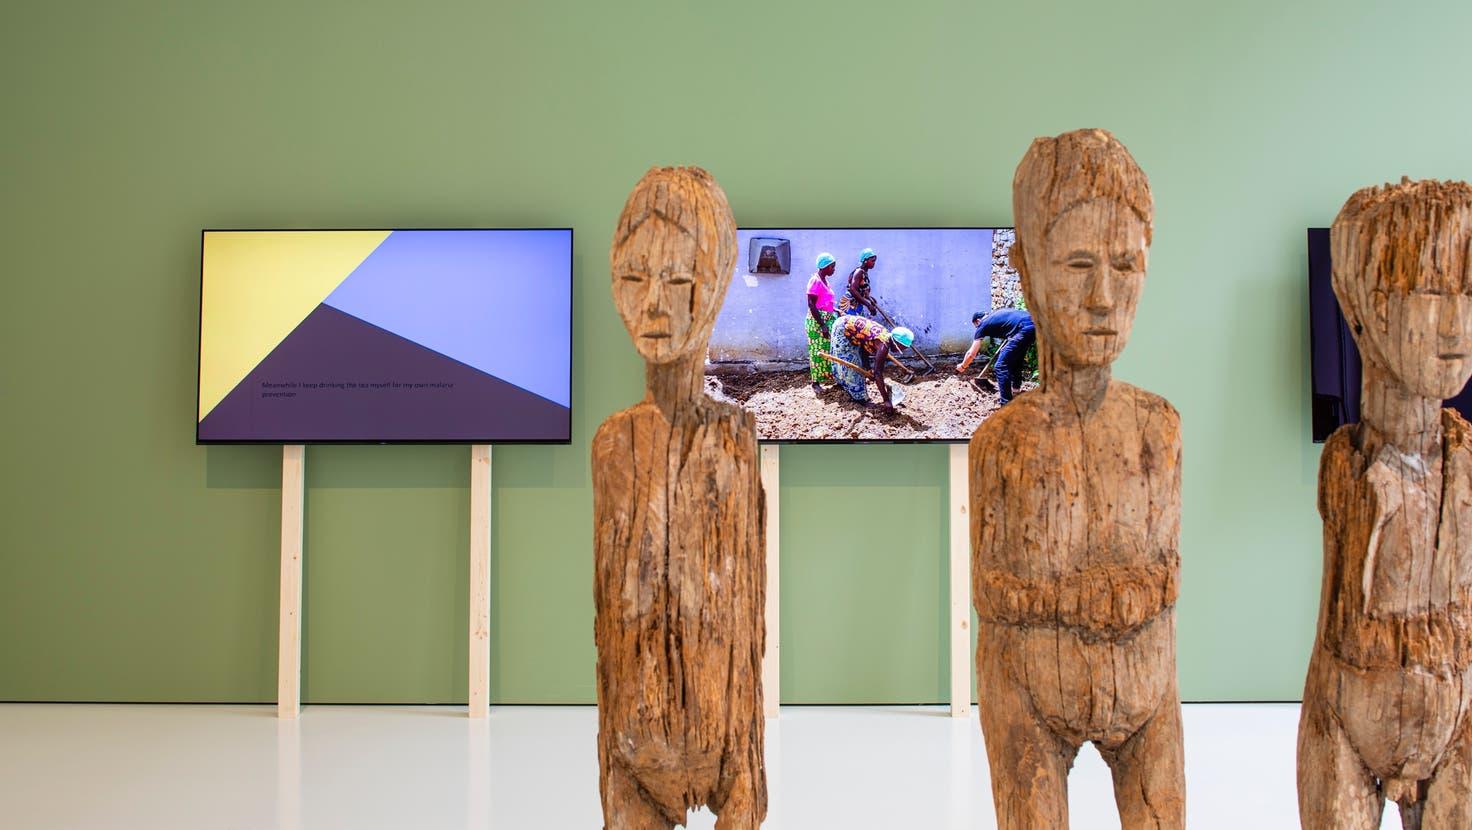 2019 lud das Museum der Kulturen Basel mit der Ausstellung «Wissensdrang trifft Sammelwut». (Omar Lemke,zvg / MKB,BLZ)